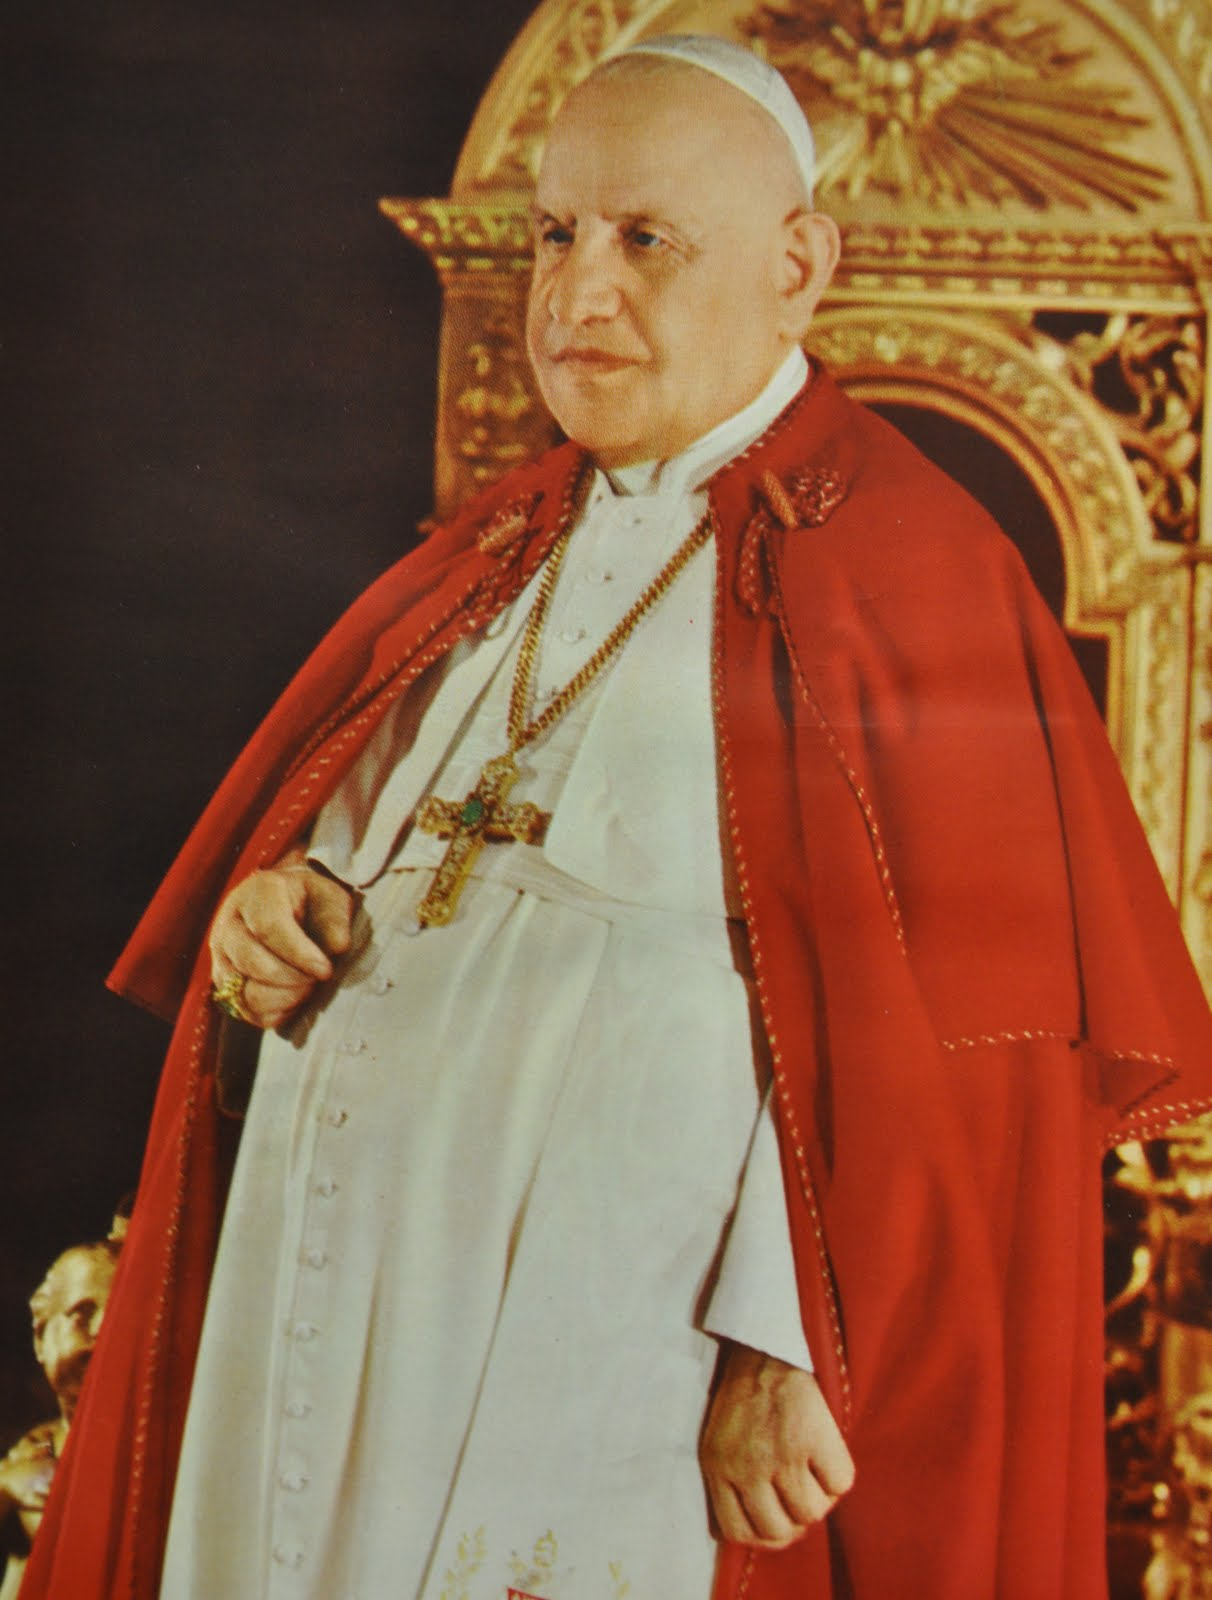 Pope John XXIII Parish is a Roman Catholic Faith Community in the Spirit of the Gospels and Vatican II that